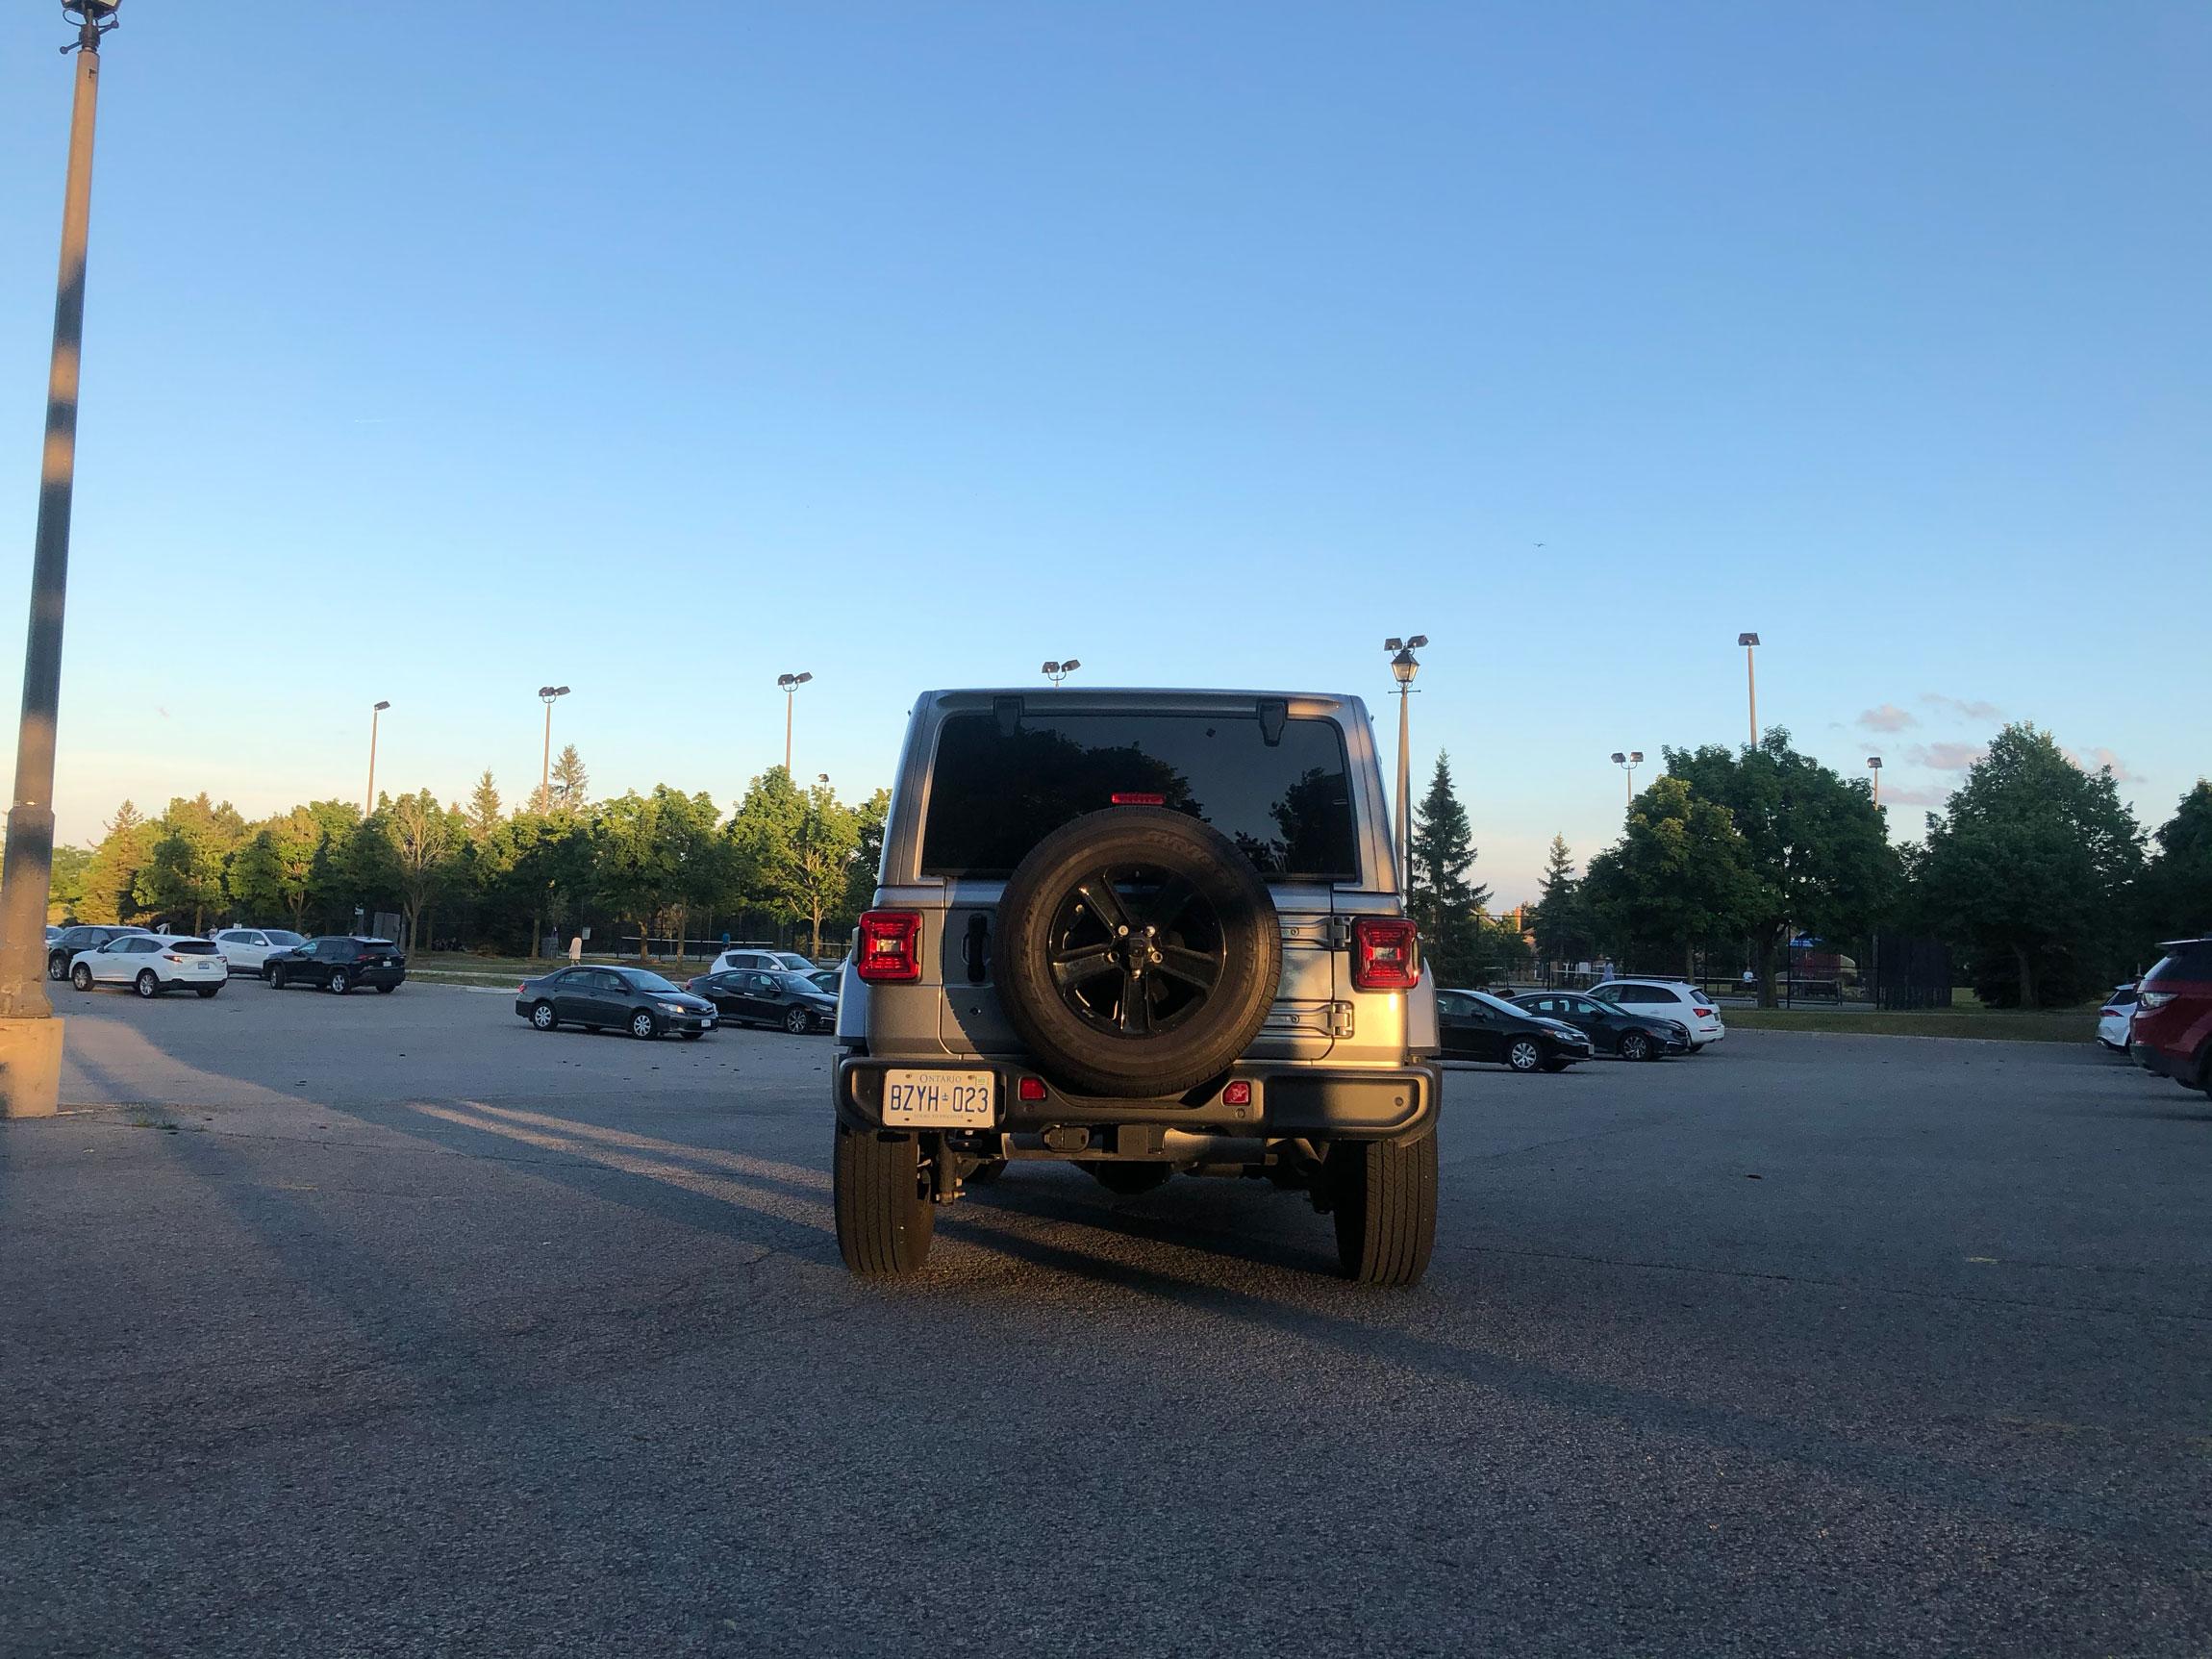 2019 Jeep Wrangler Unlimited full